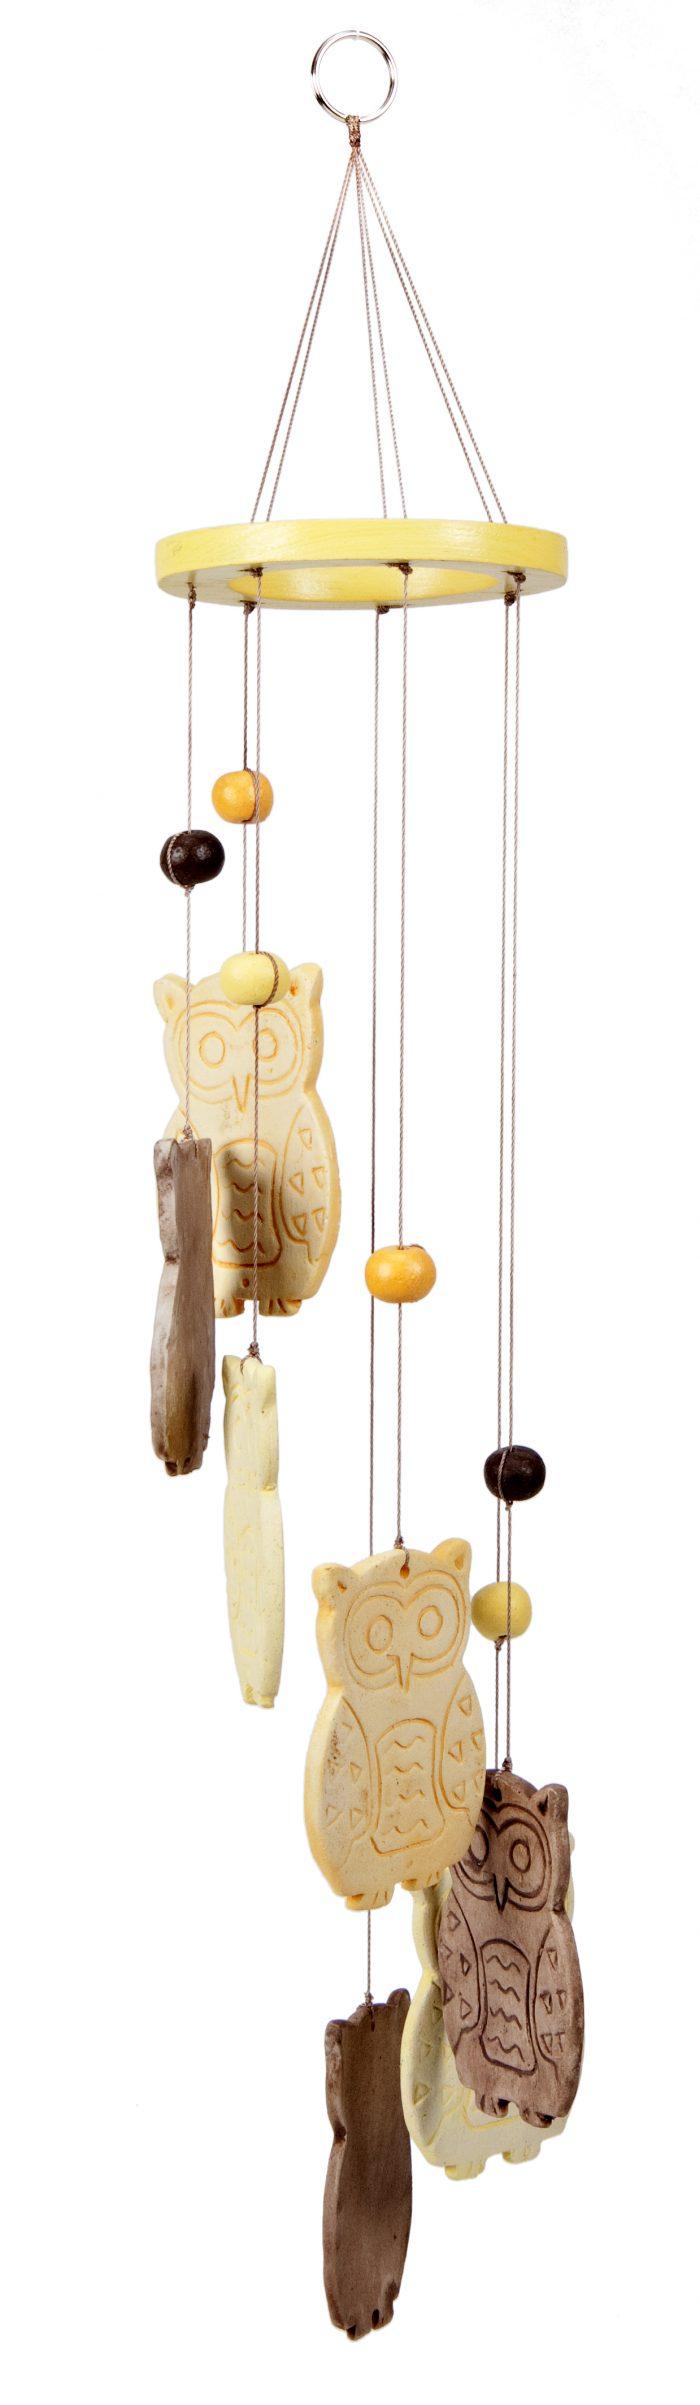 Sarana Windchime Ceramic Owls Natural